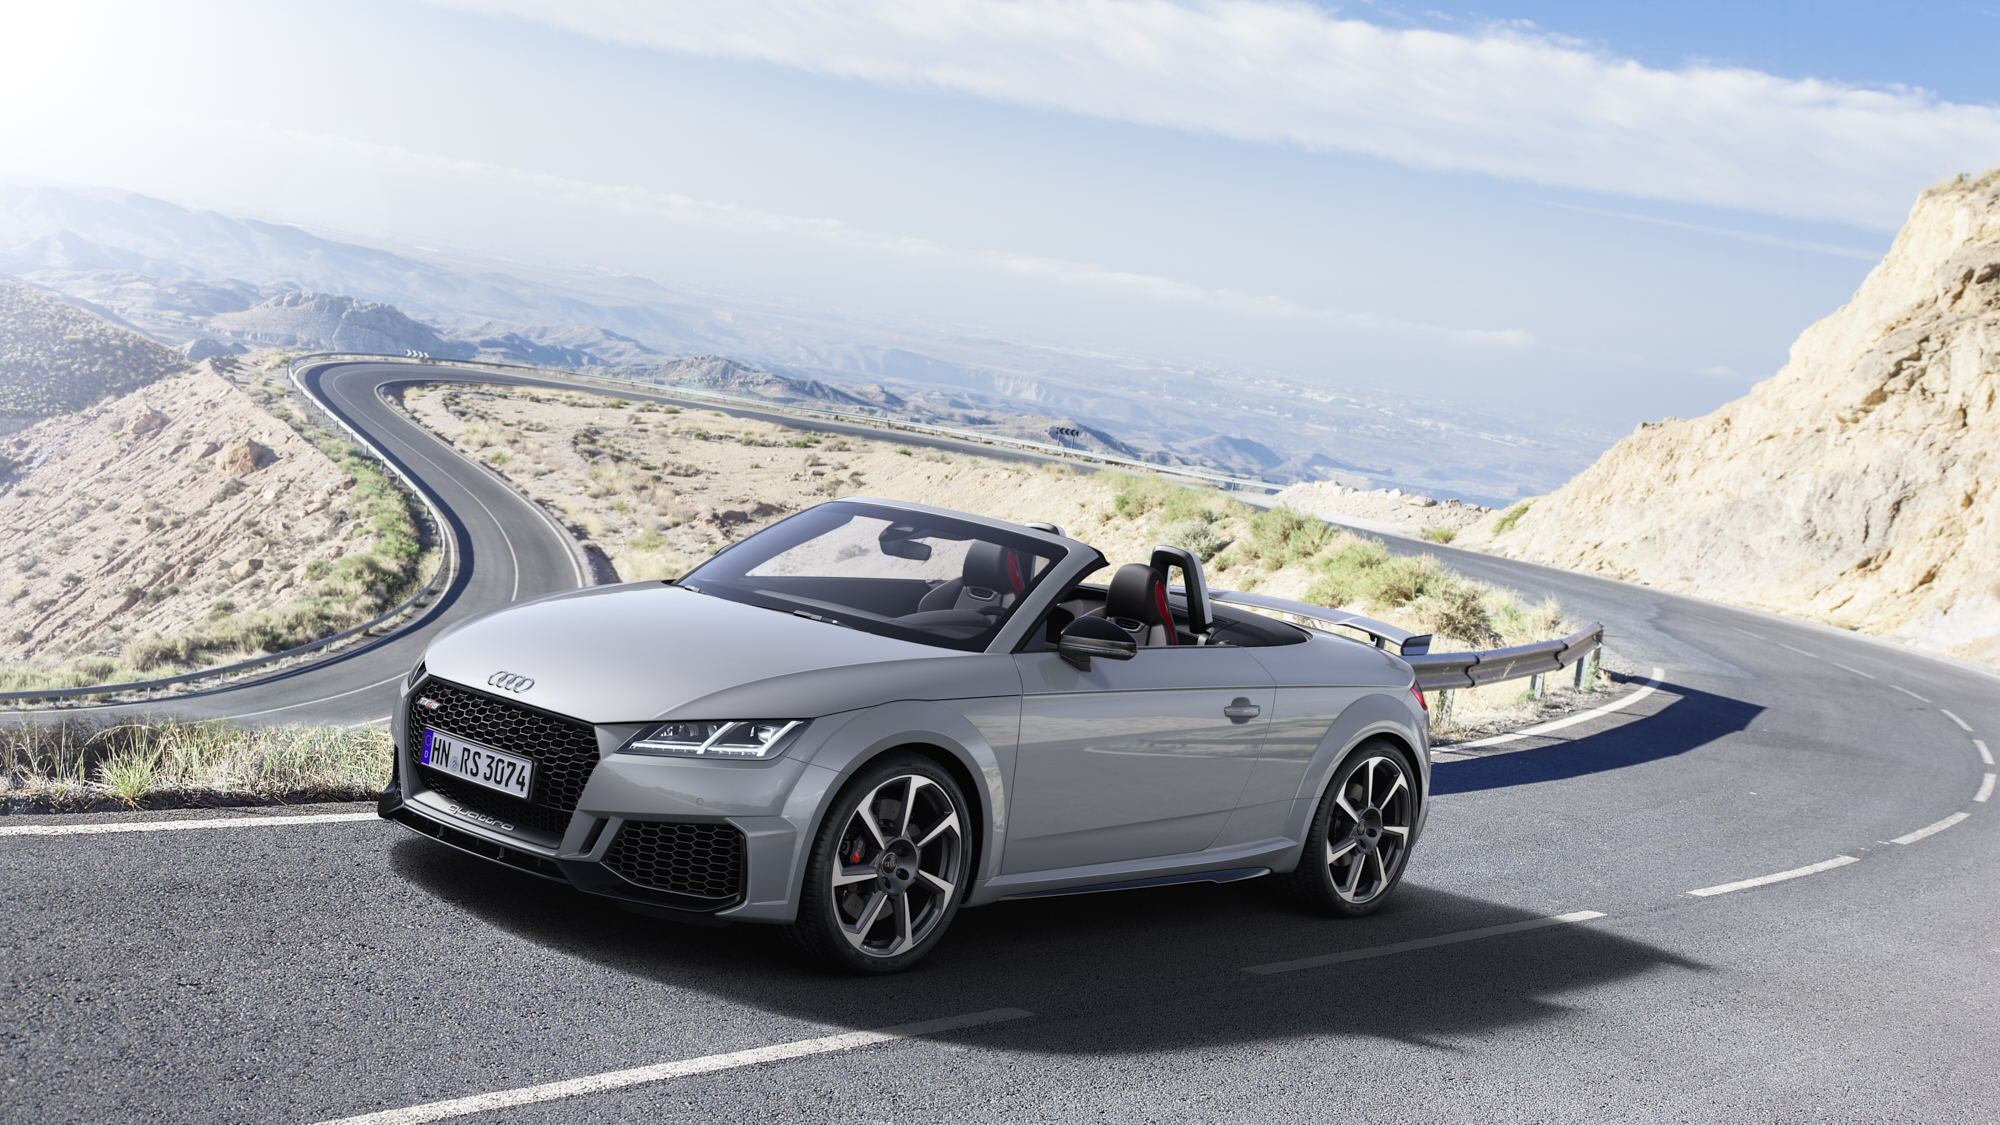 RWink_Audi_TTRS_Roadster_Static_005_B2200